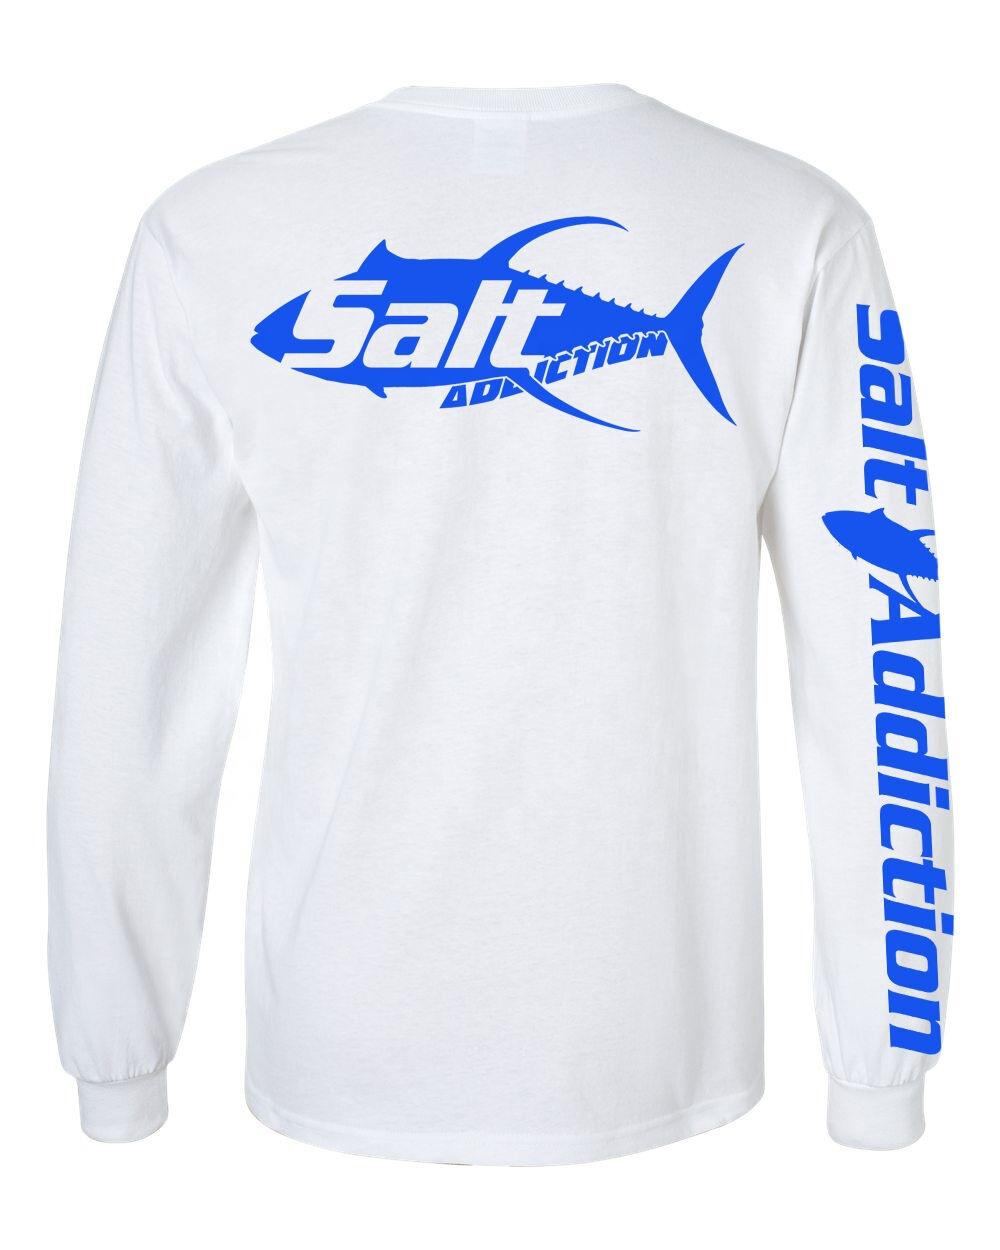 quick dry upf 50 long sleeve huk uv protection sublimation custom polyester blank performance wholesale fishing Shirt For Men